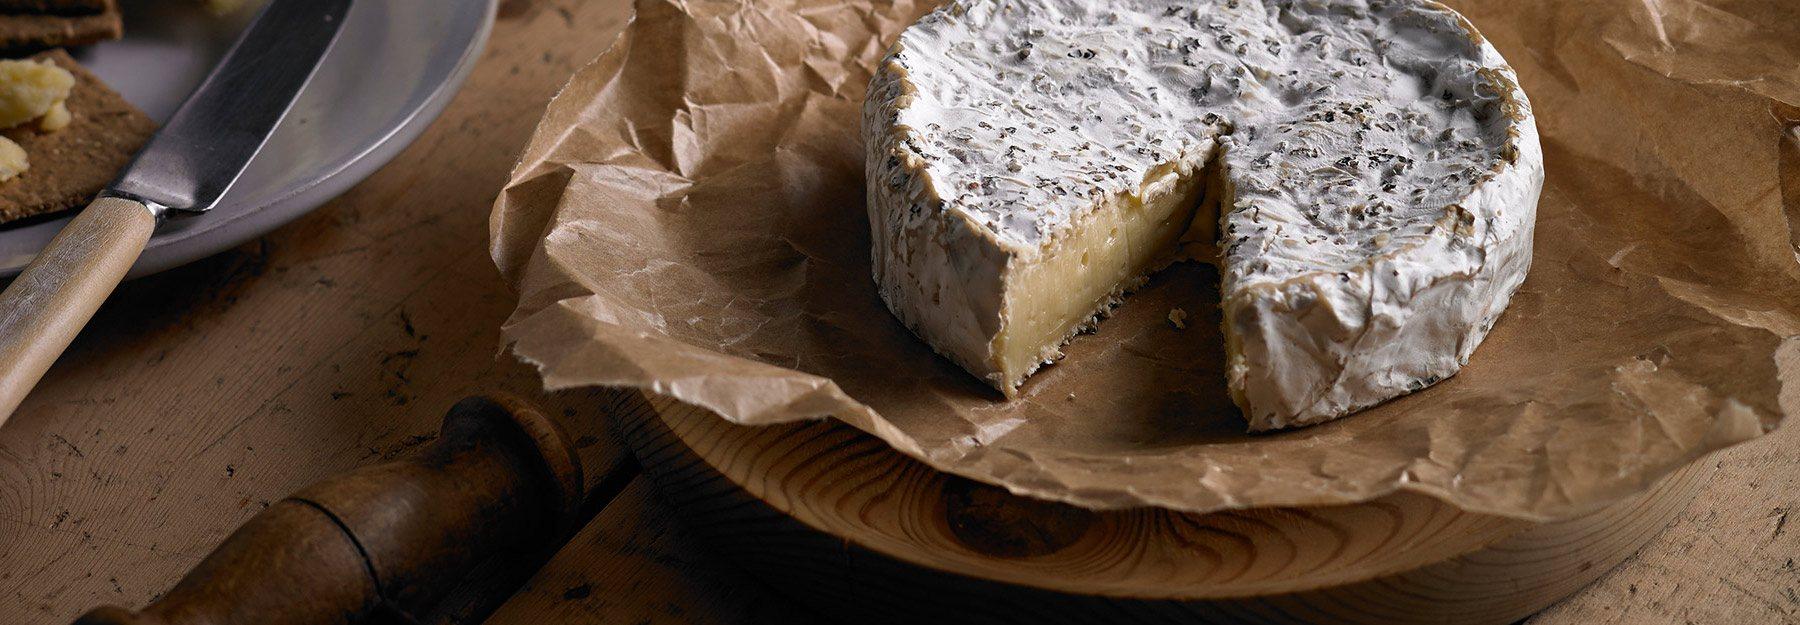 Cheese, Salmon & Deli Hampers